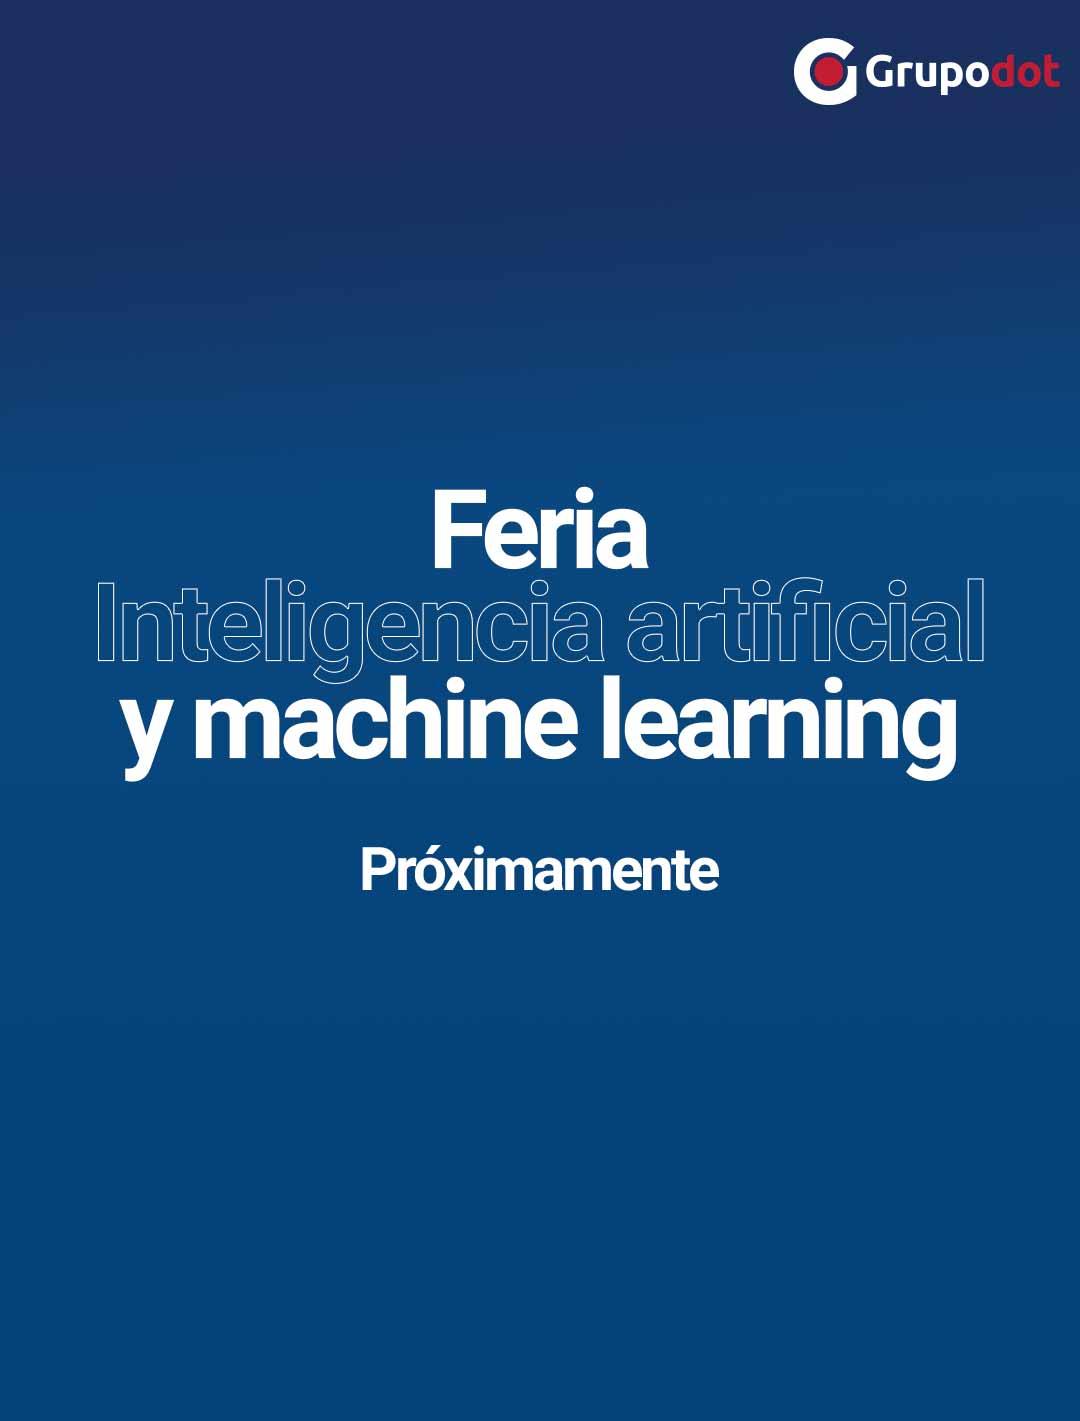 Feria Inteligencia artificial y machine learning